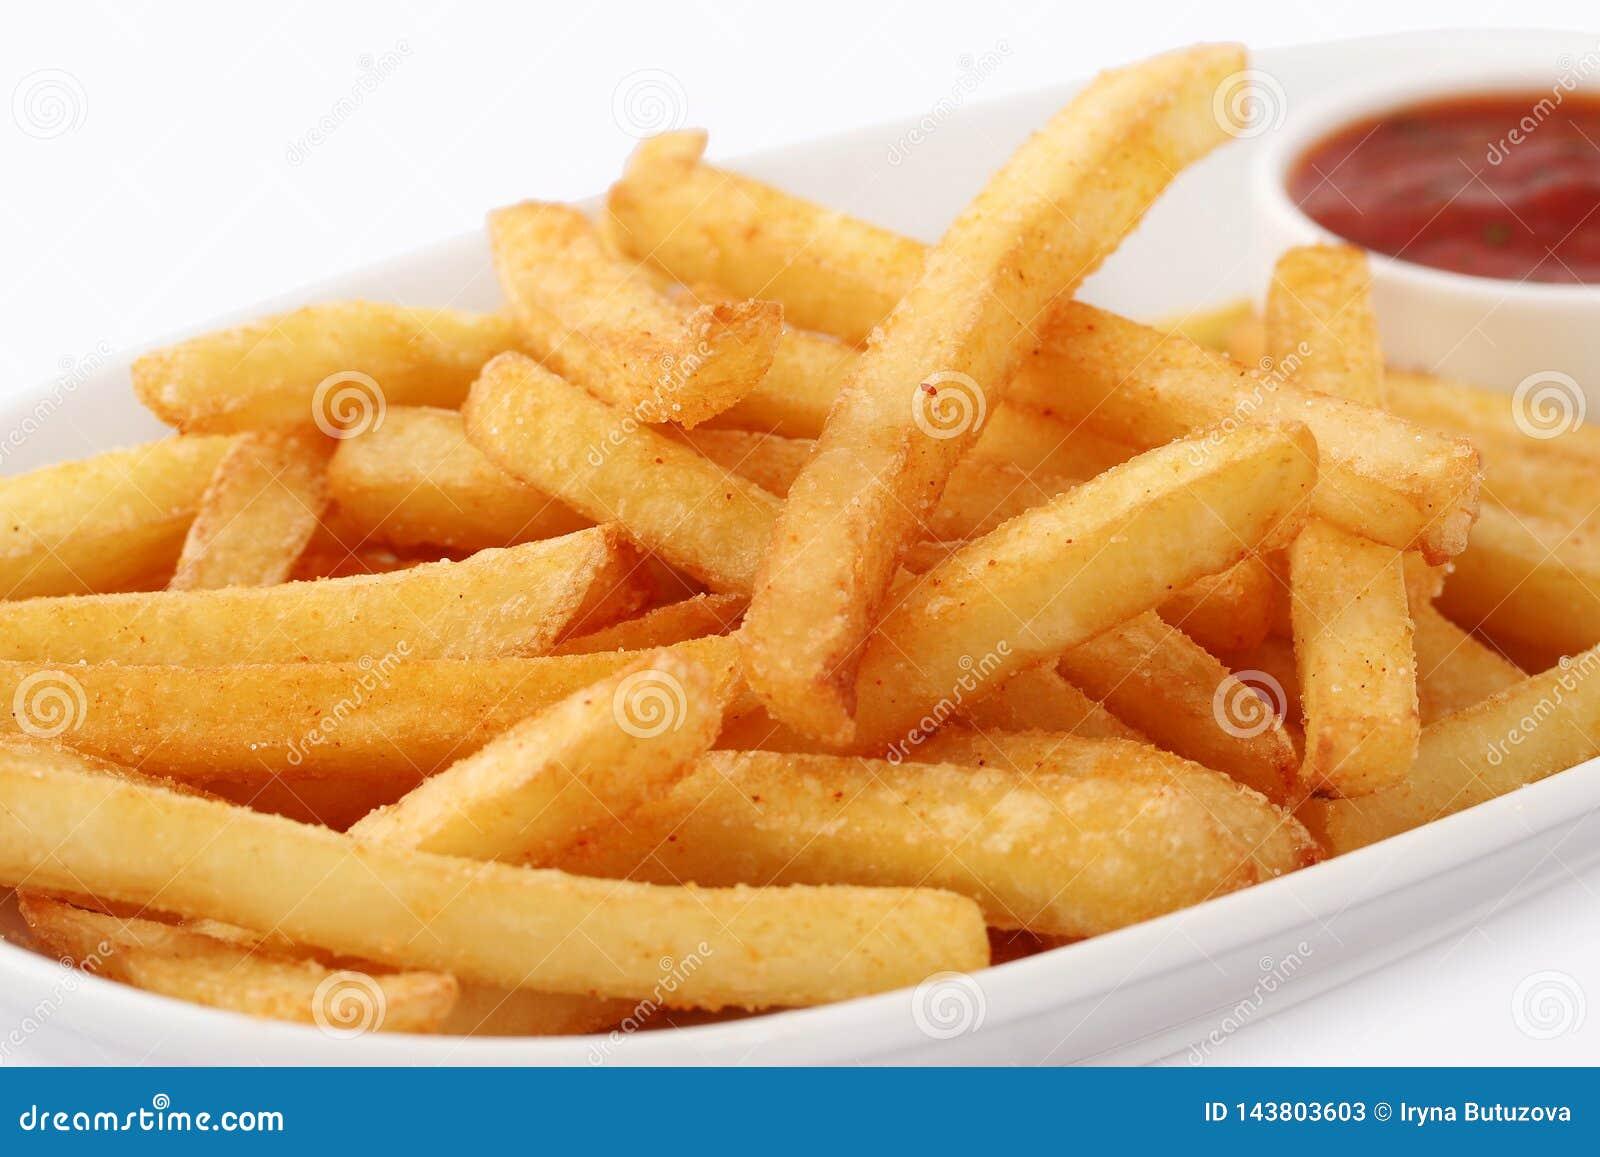 Porci?n de patatas fritas reci?n hechas